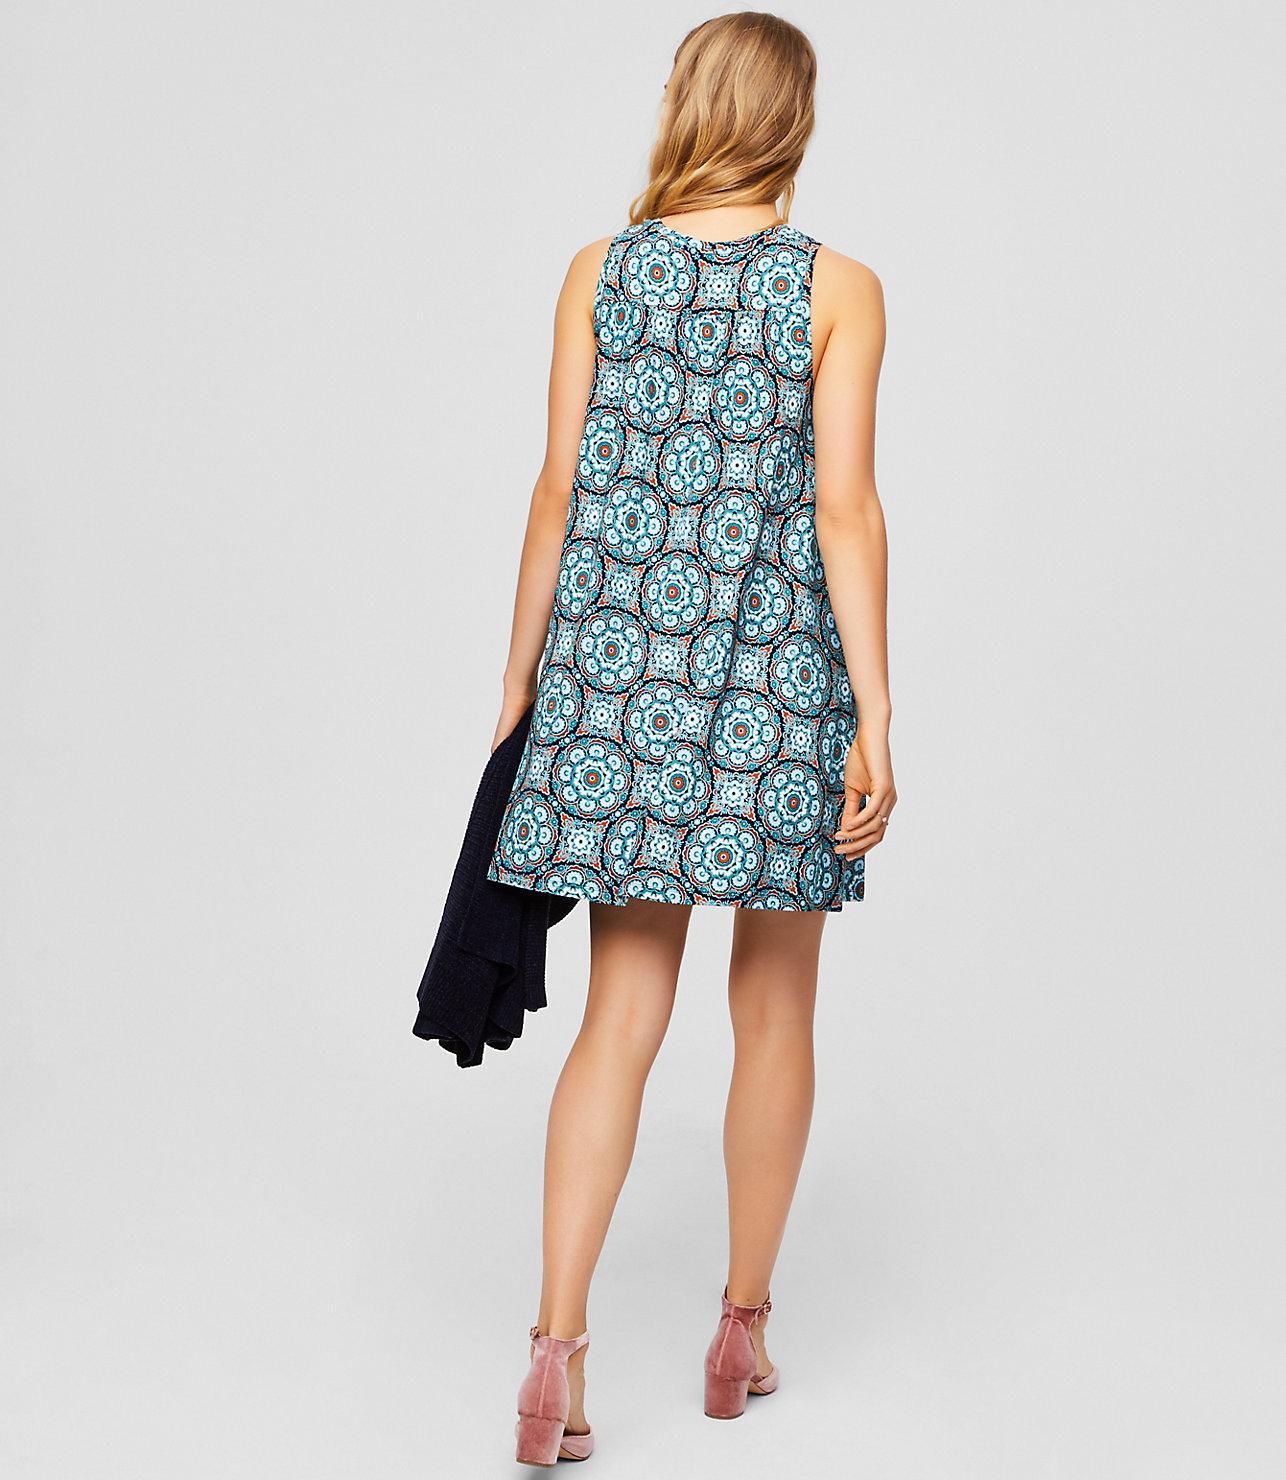 91bfab459ecdf LOFT Petite Medallion Sleeveless Swing Dress in Blue - Lyst